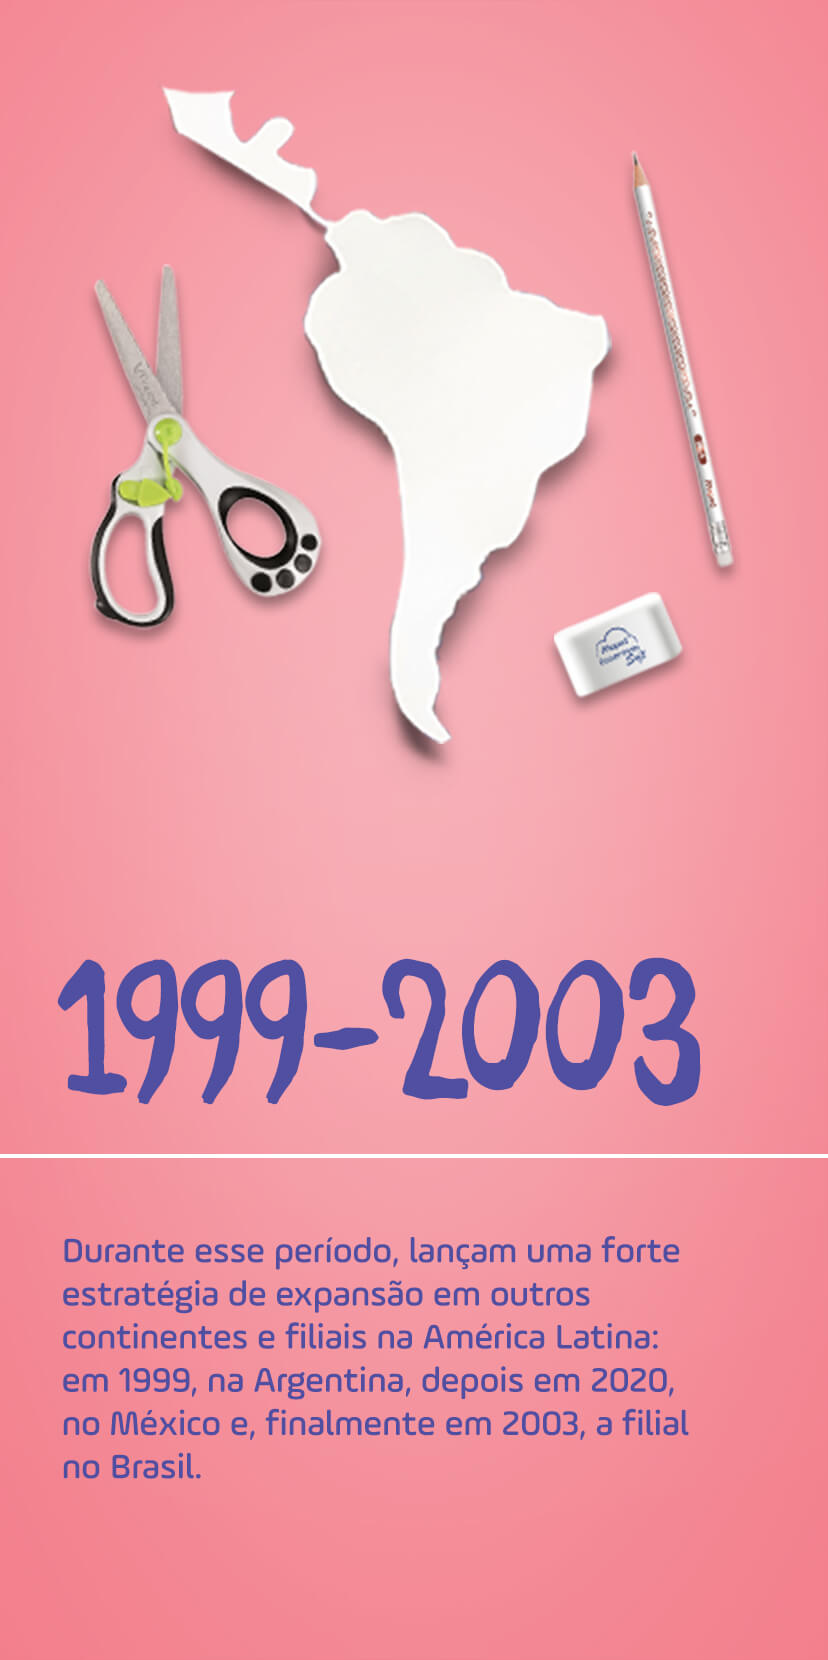 05 mobile 1999 2003